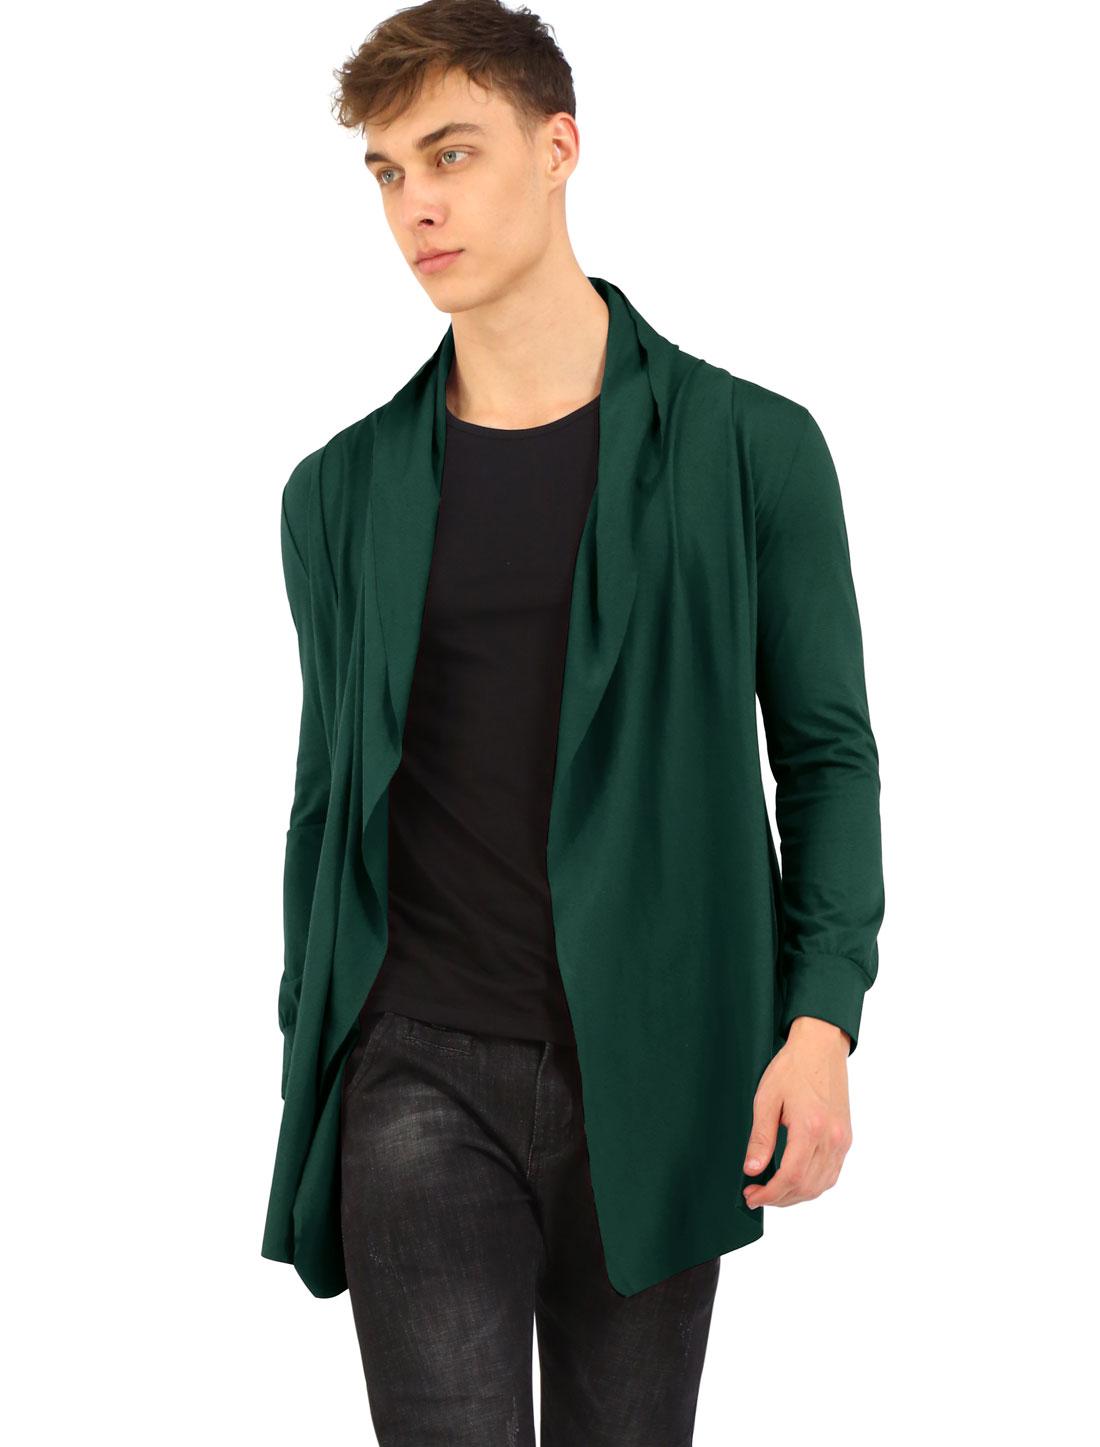 Men Shawl Collar Open Front Pockets High-Low Hem Cardigan Green S